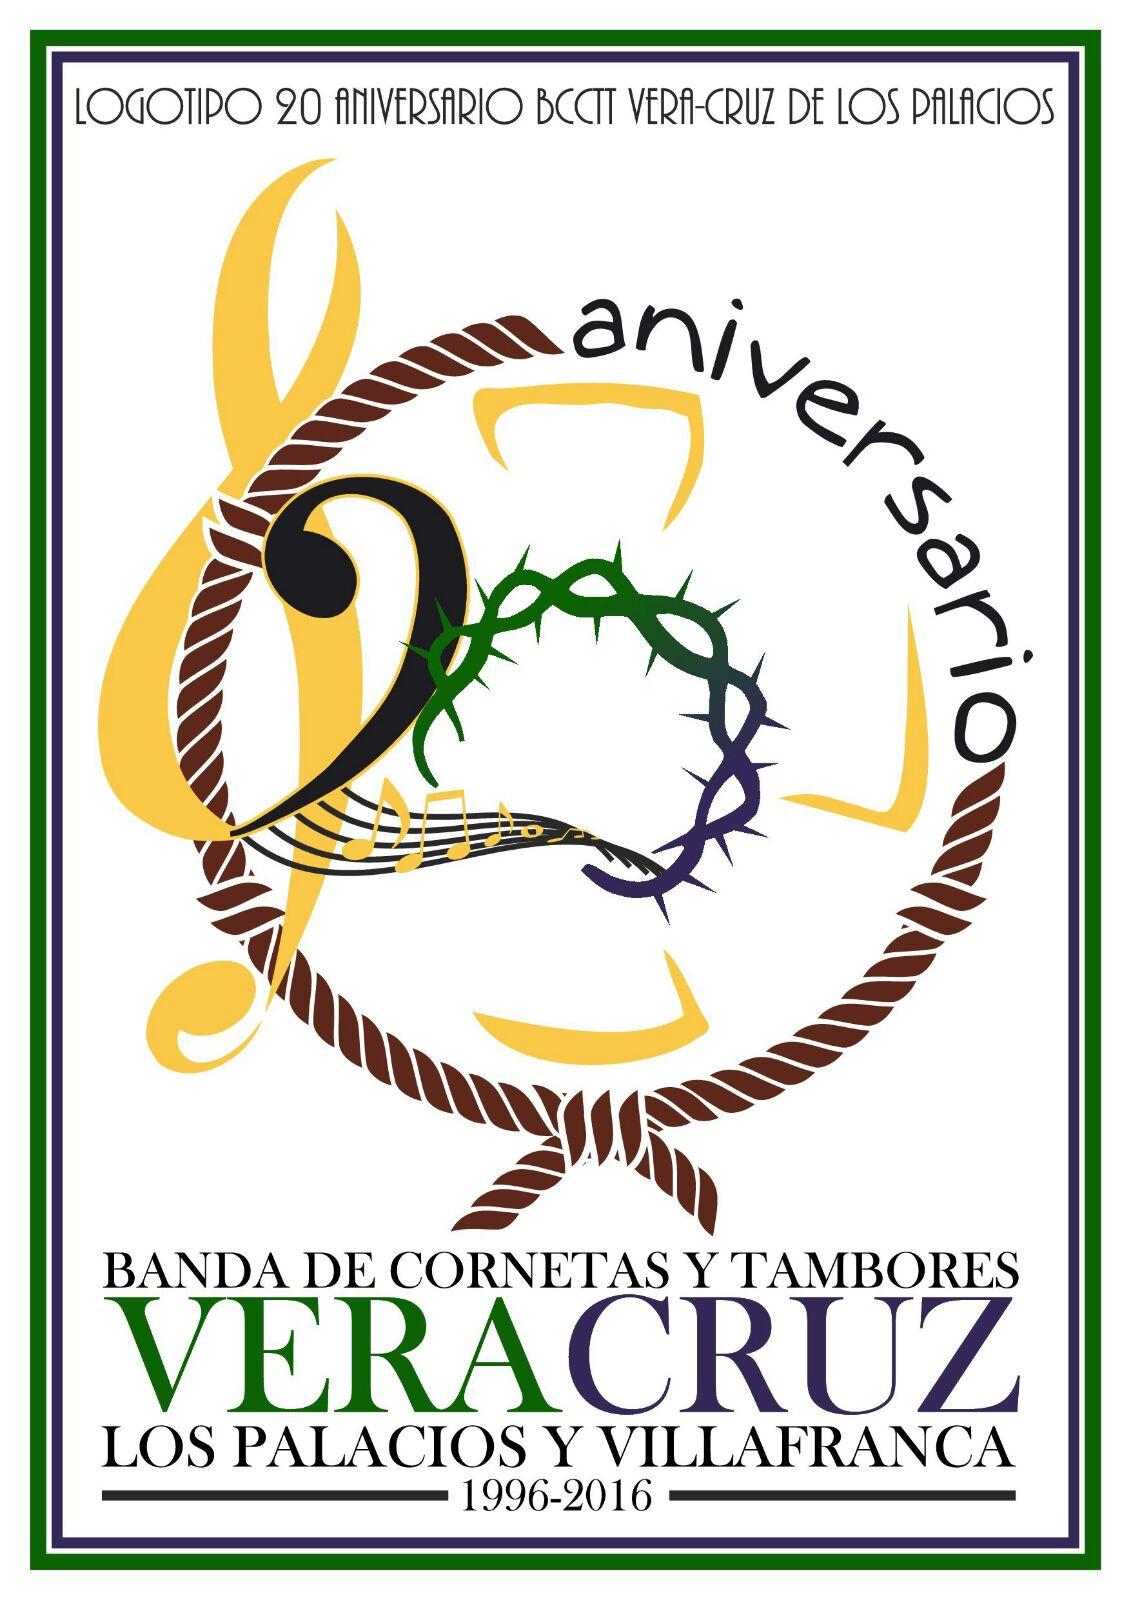 LOGOTIPO XX ANIVERSARIO(1996-2016)